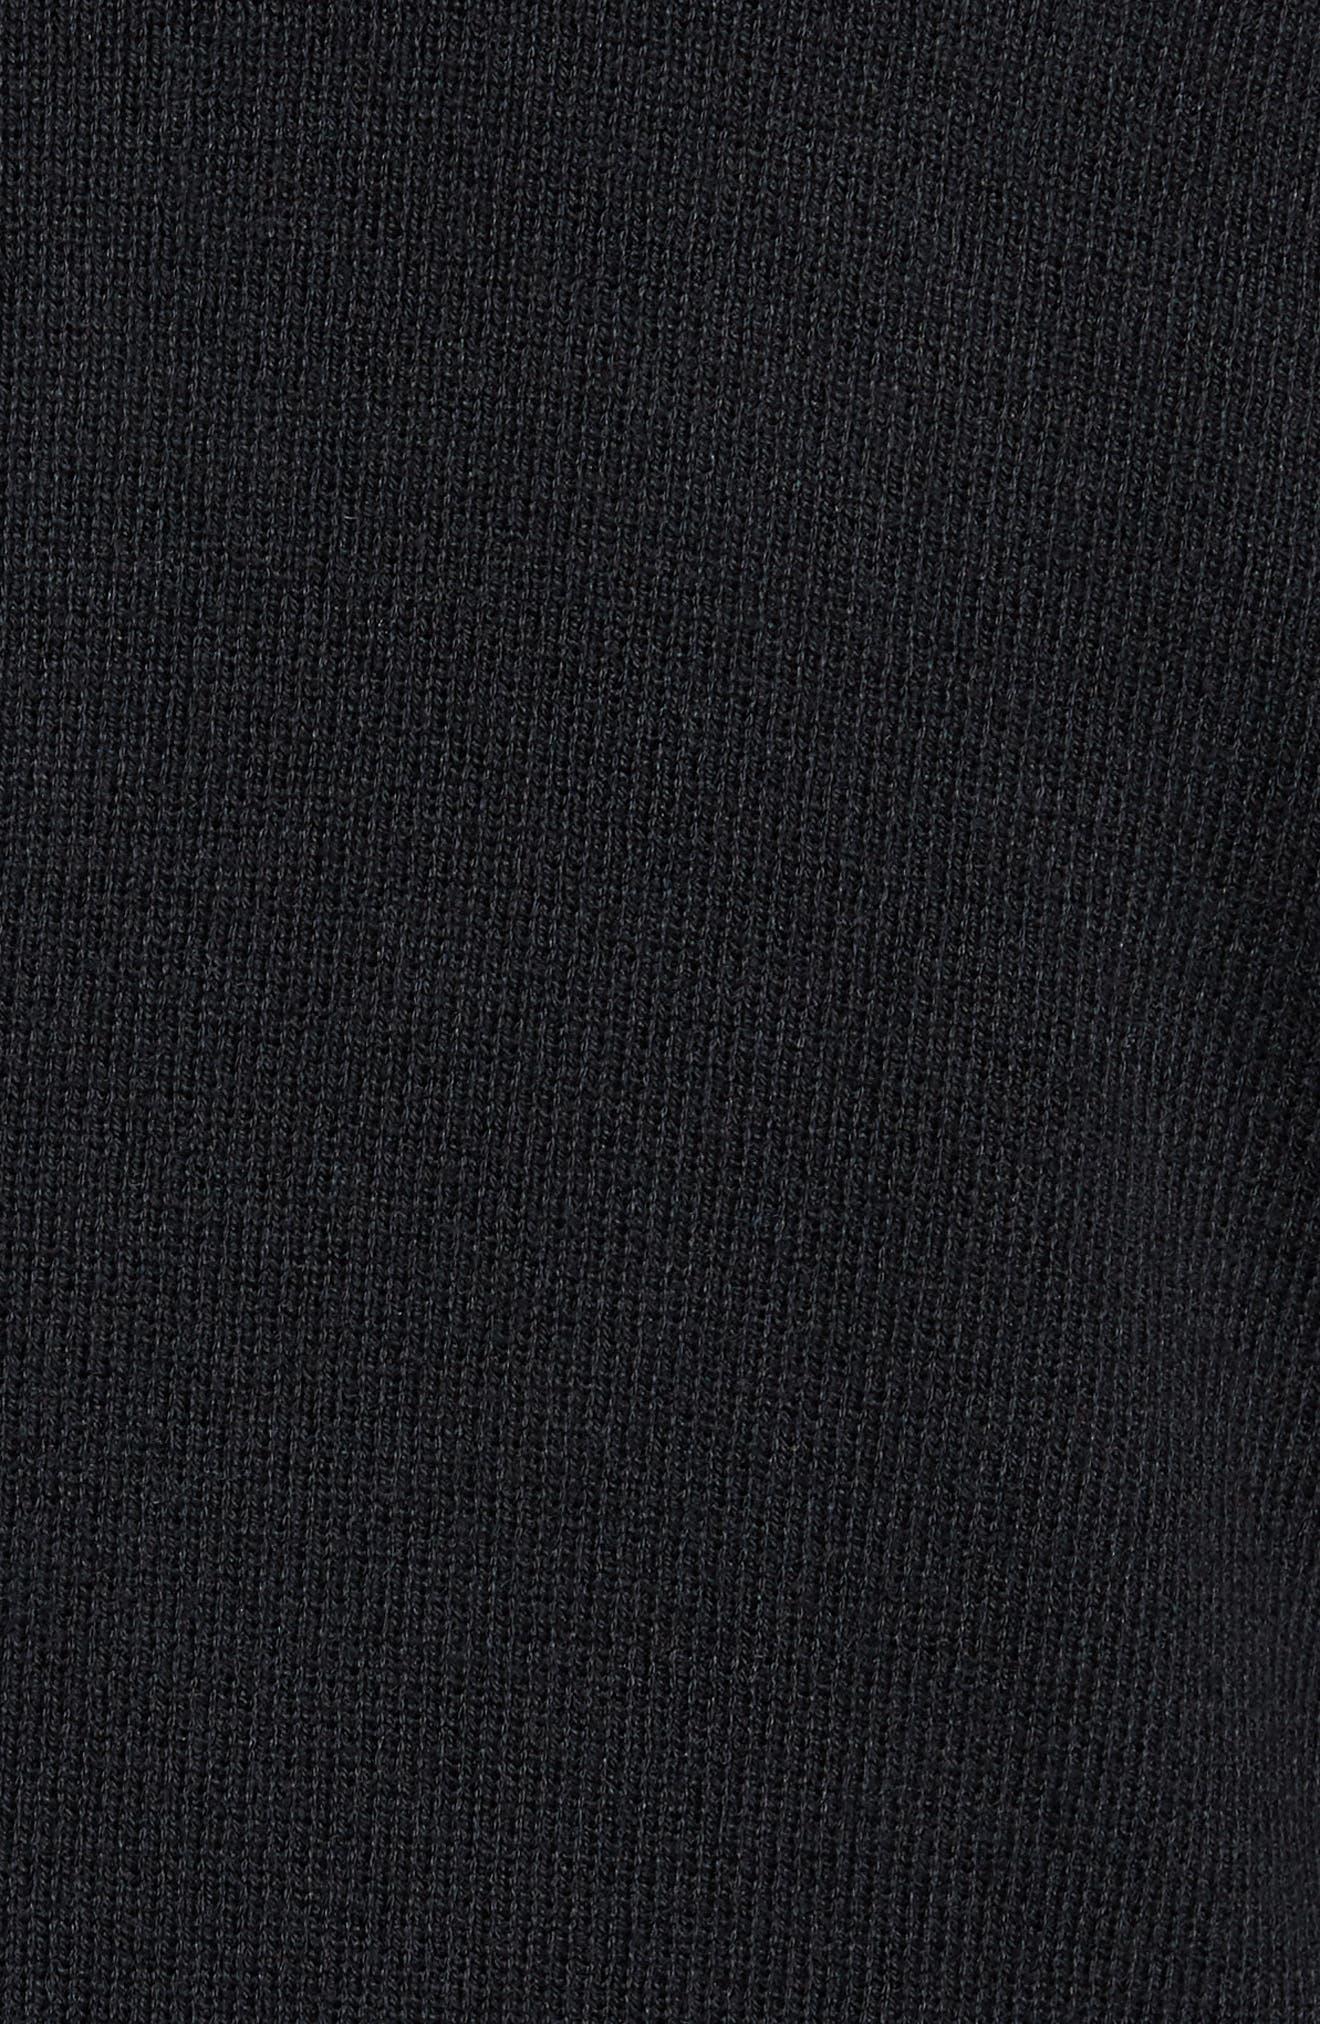 Zip Front Sweater Jacket,                             Alternate thumbnail 5, color,                             BLACK